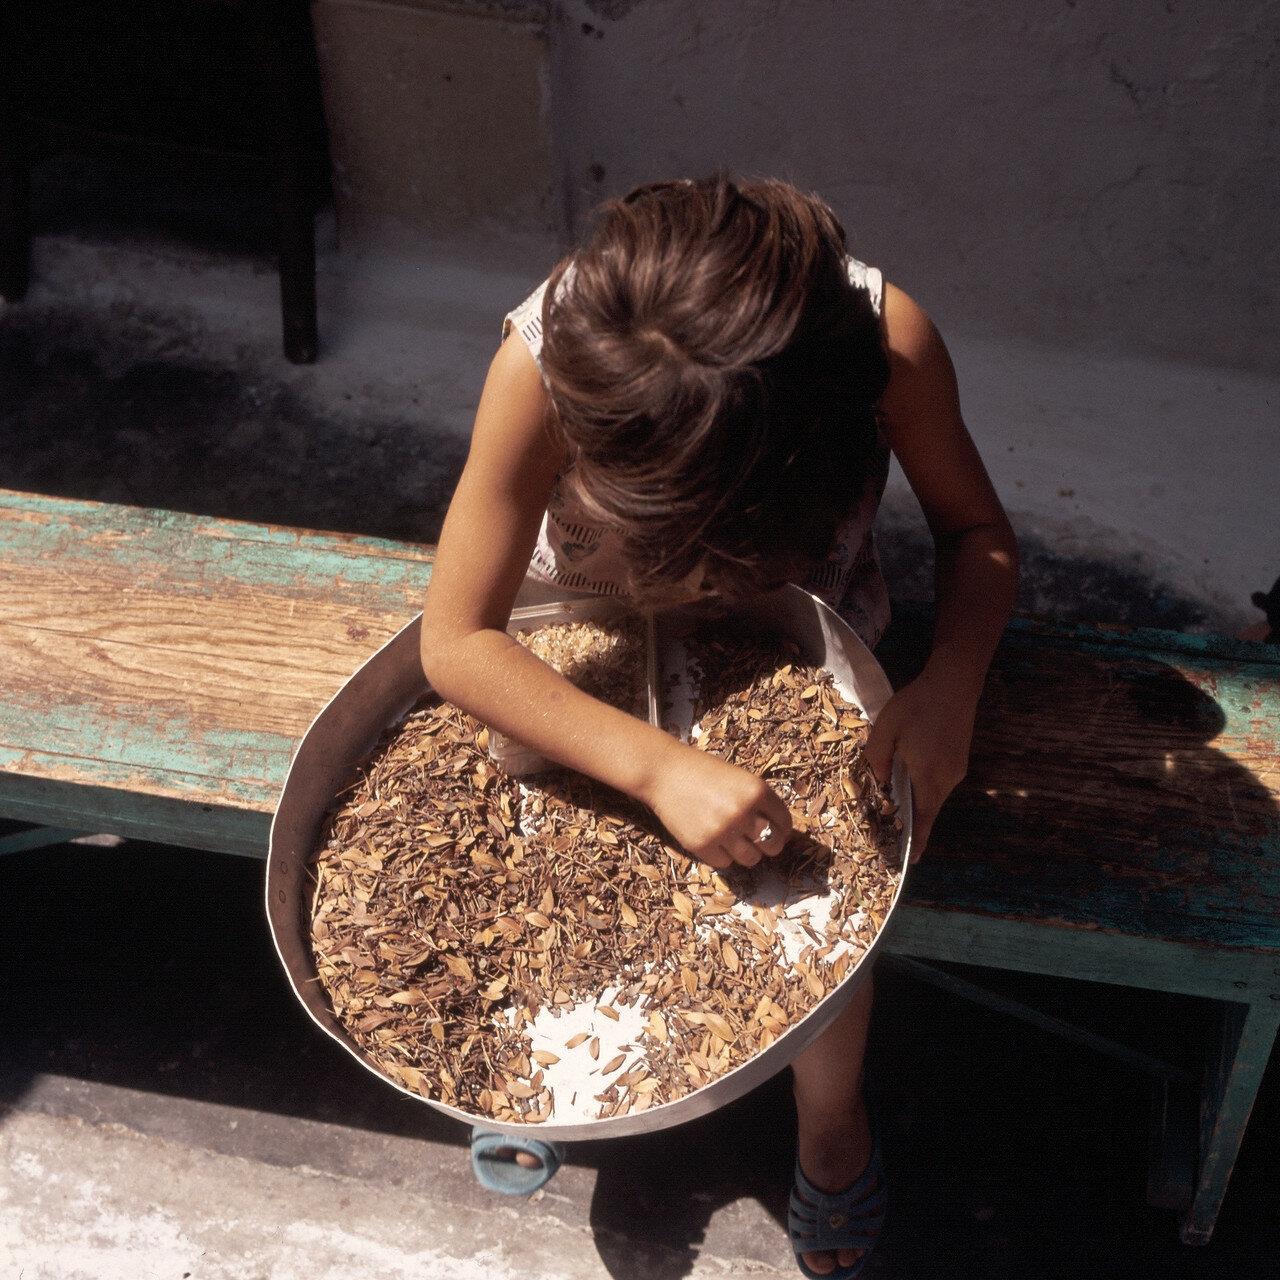 1972. Хиос. Ребенок собирает мастику